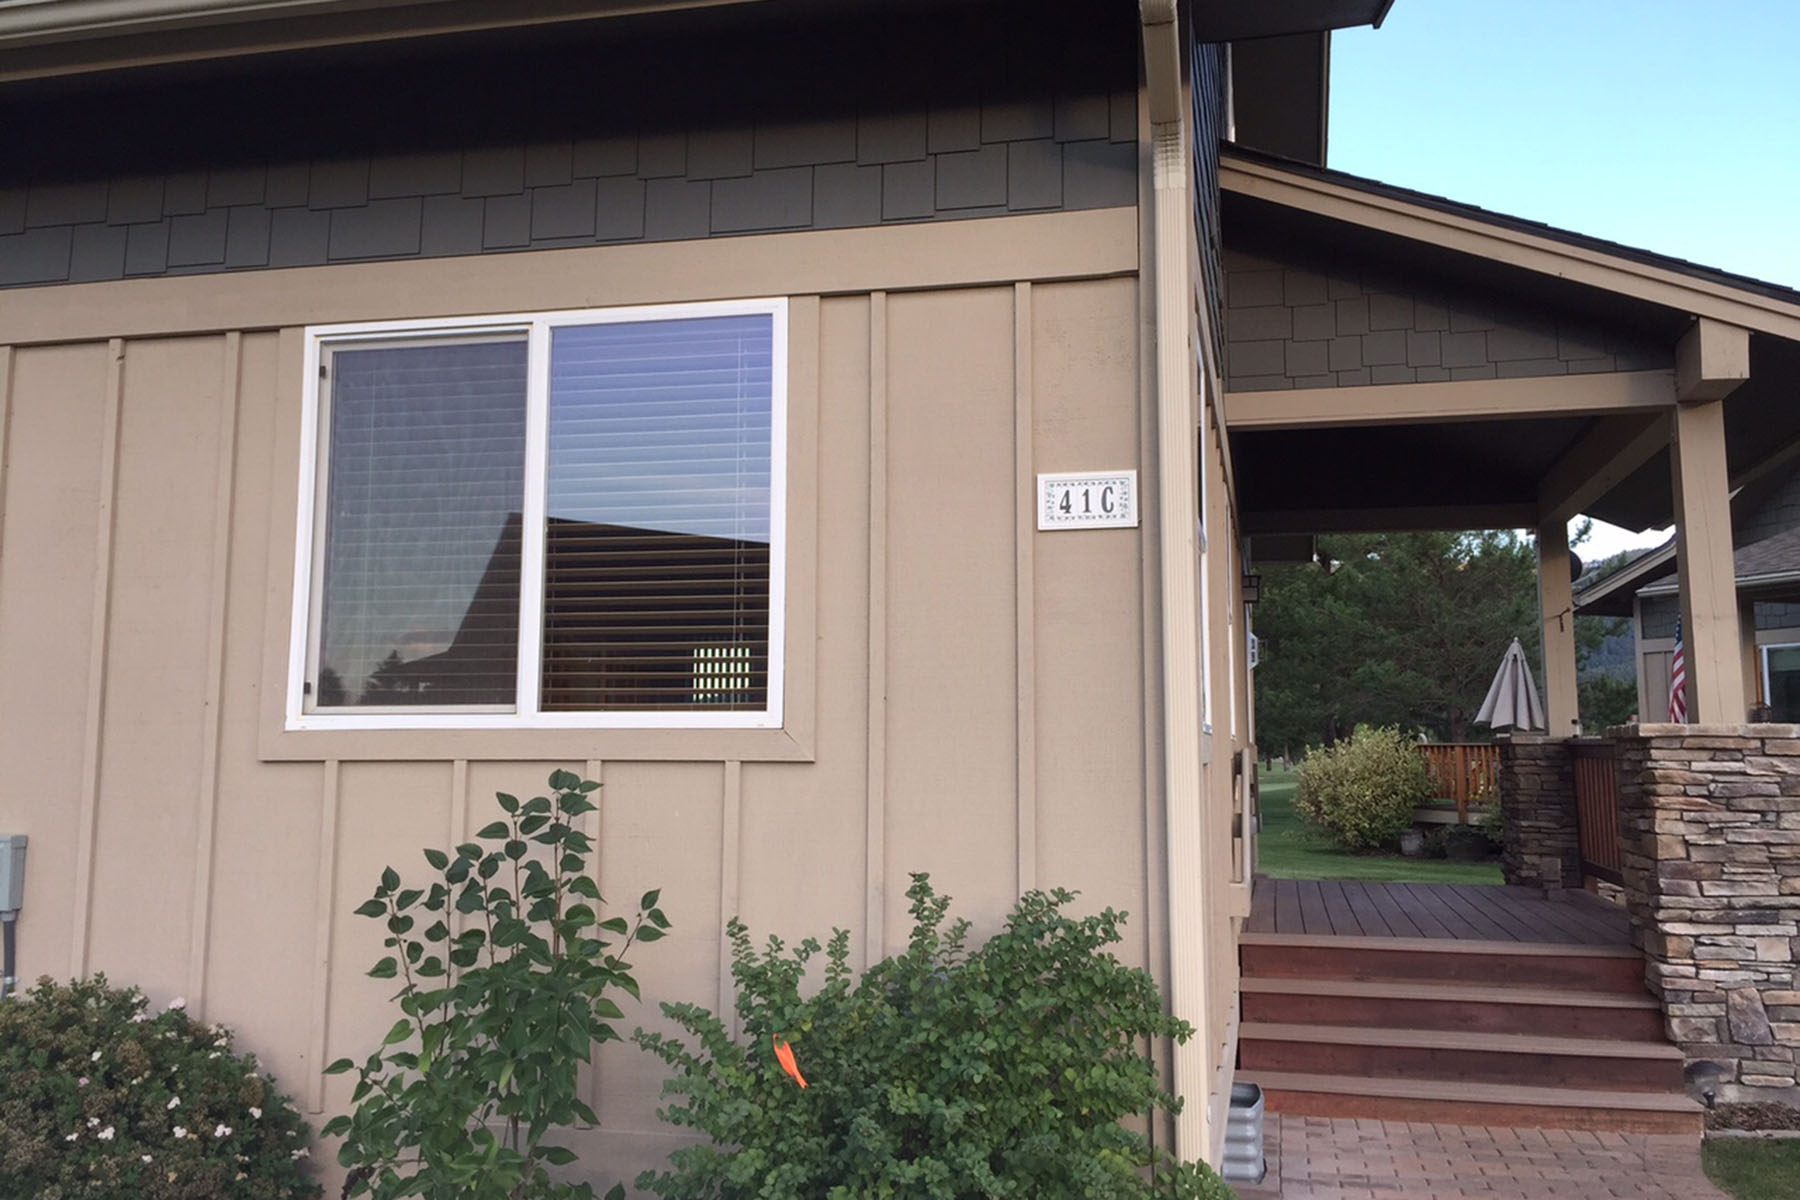 Casa unifamiliar adosada (Townhouse) por un Venta en Charming Townhome on the 15th Green 41 Chardonnay Dr #C Blanchard, Idaho, 83804 Estados Unidos